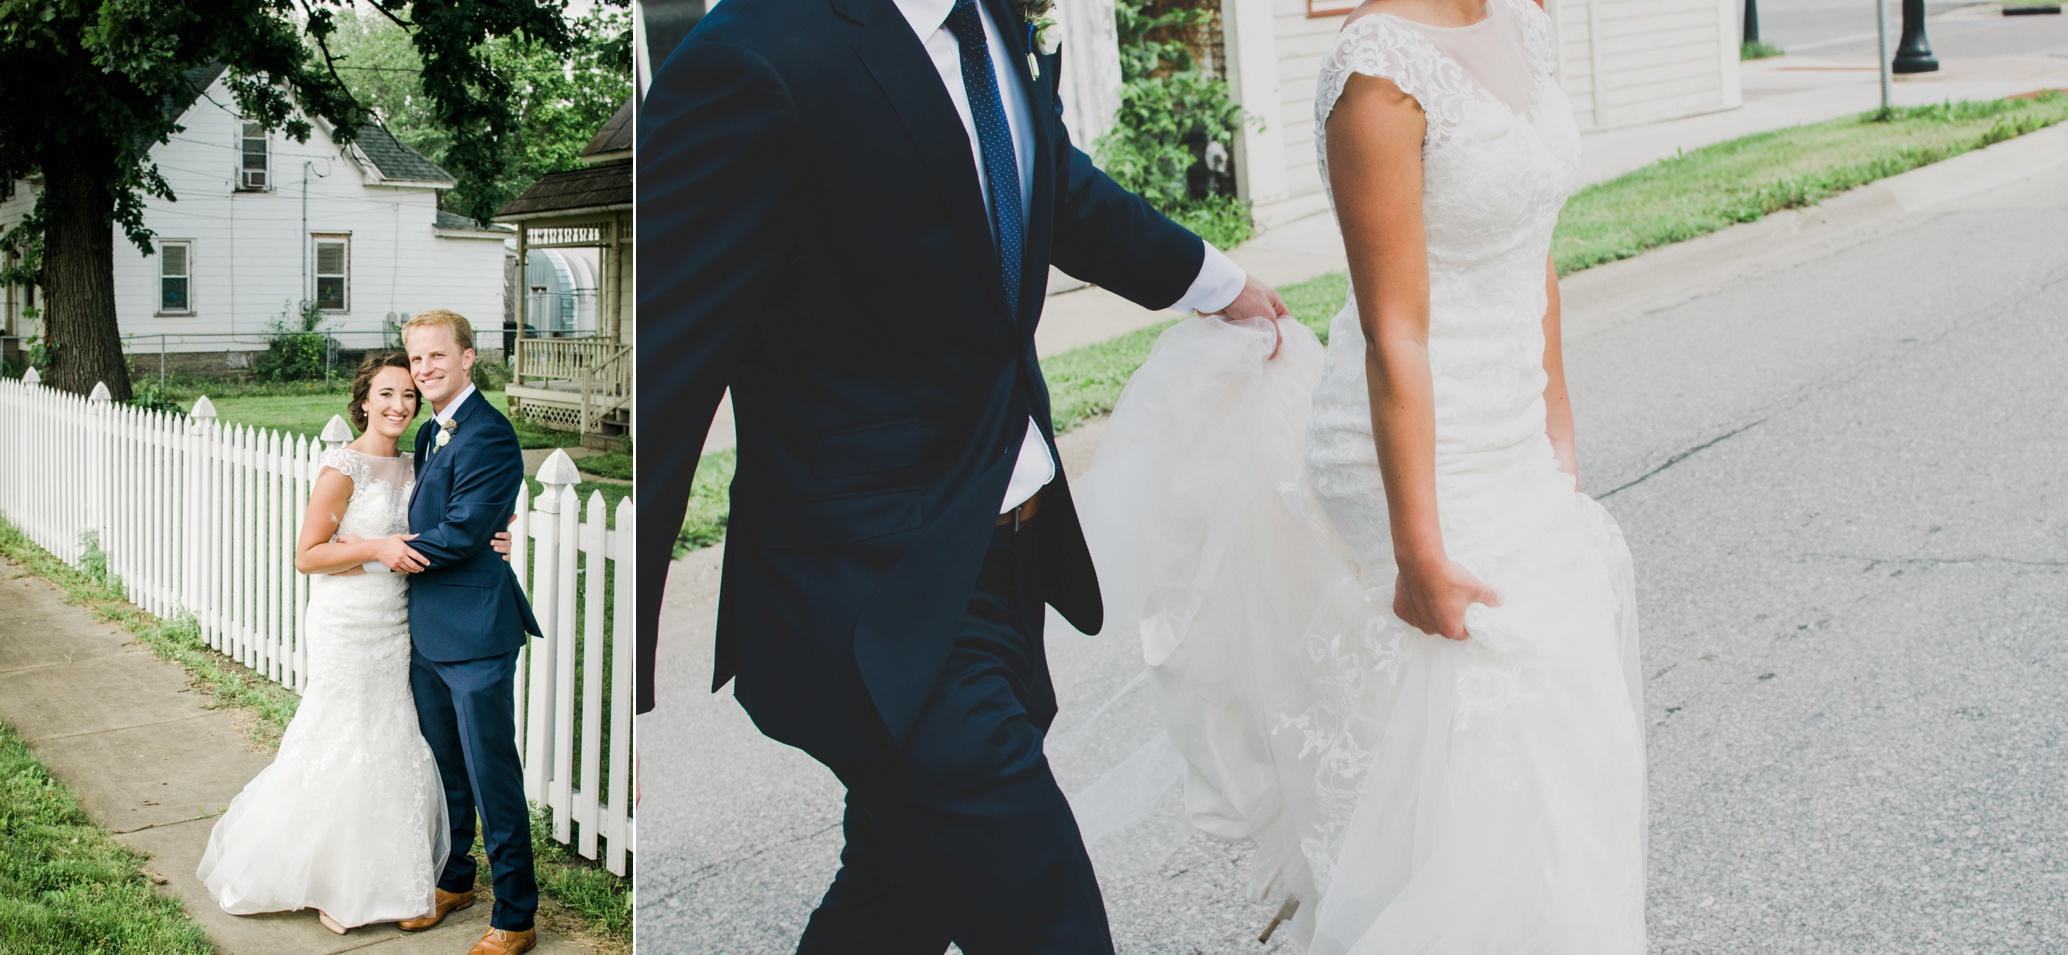 Palmer House and Stable Solon, IA | Ali Leigh Photo Minneapolis Wedding Photographer_0286.jpg